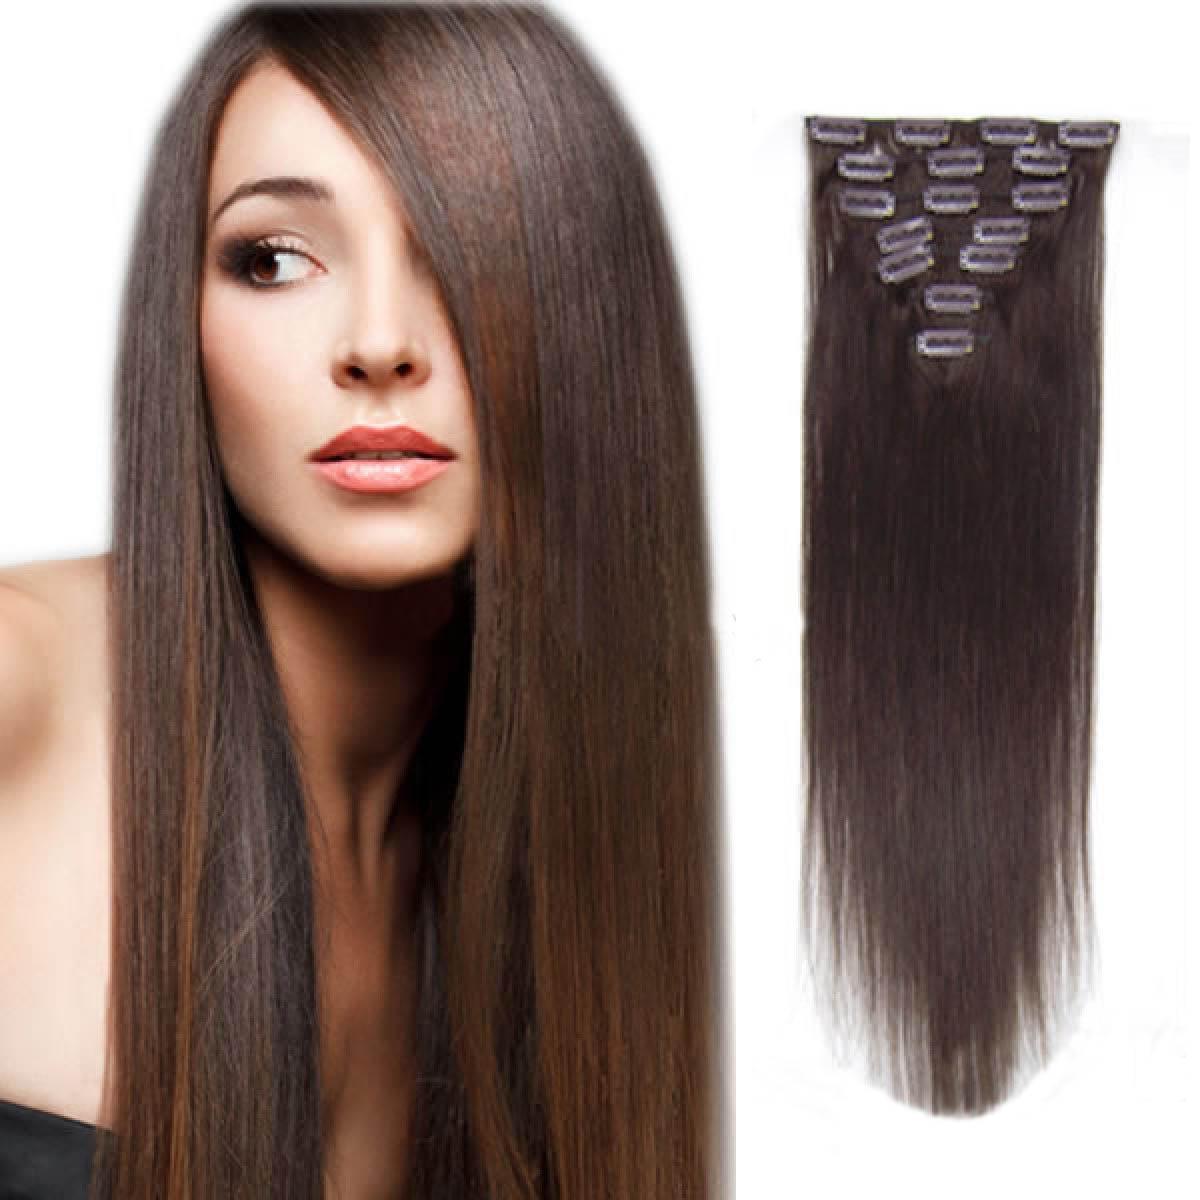 15 Inch #2 Dark Brown Clip In Human Hair Extensions 7pcs